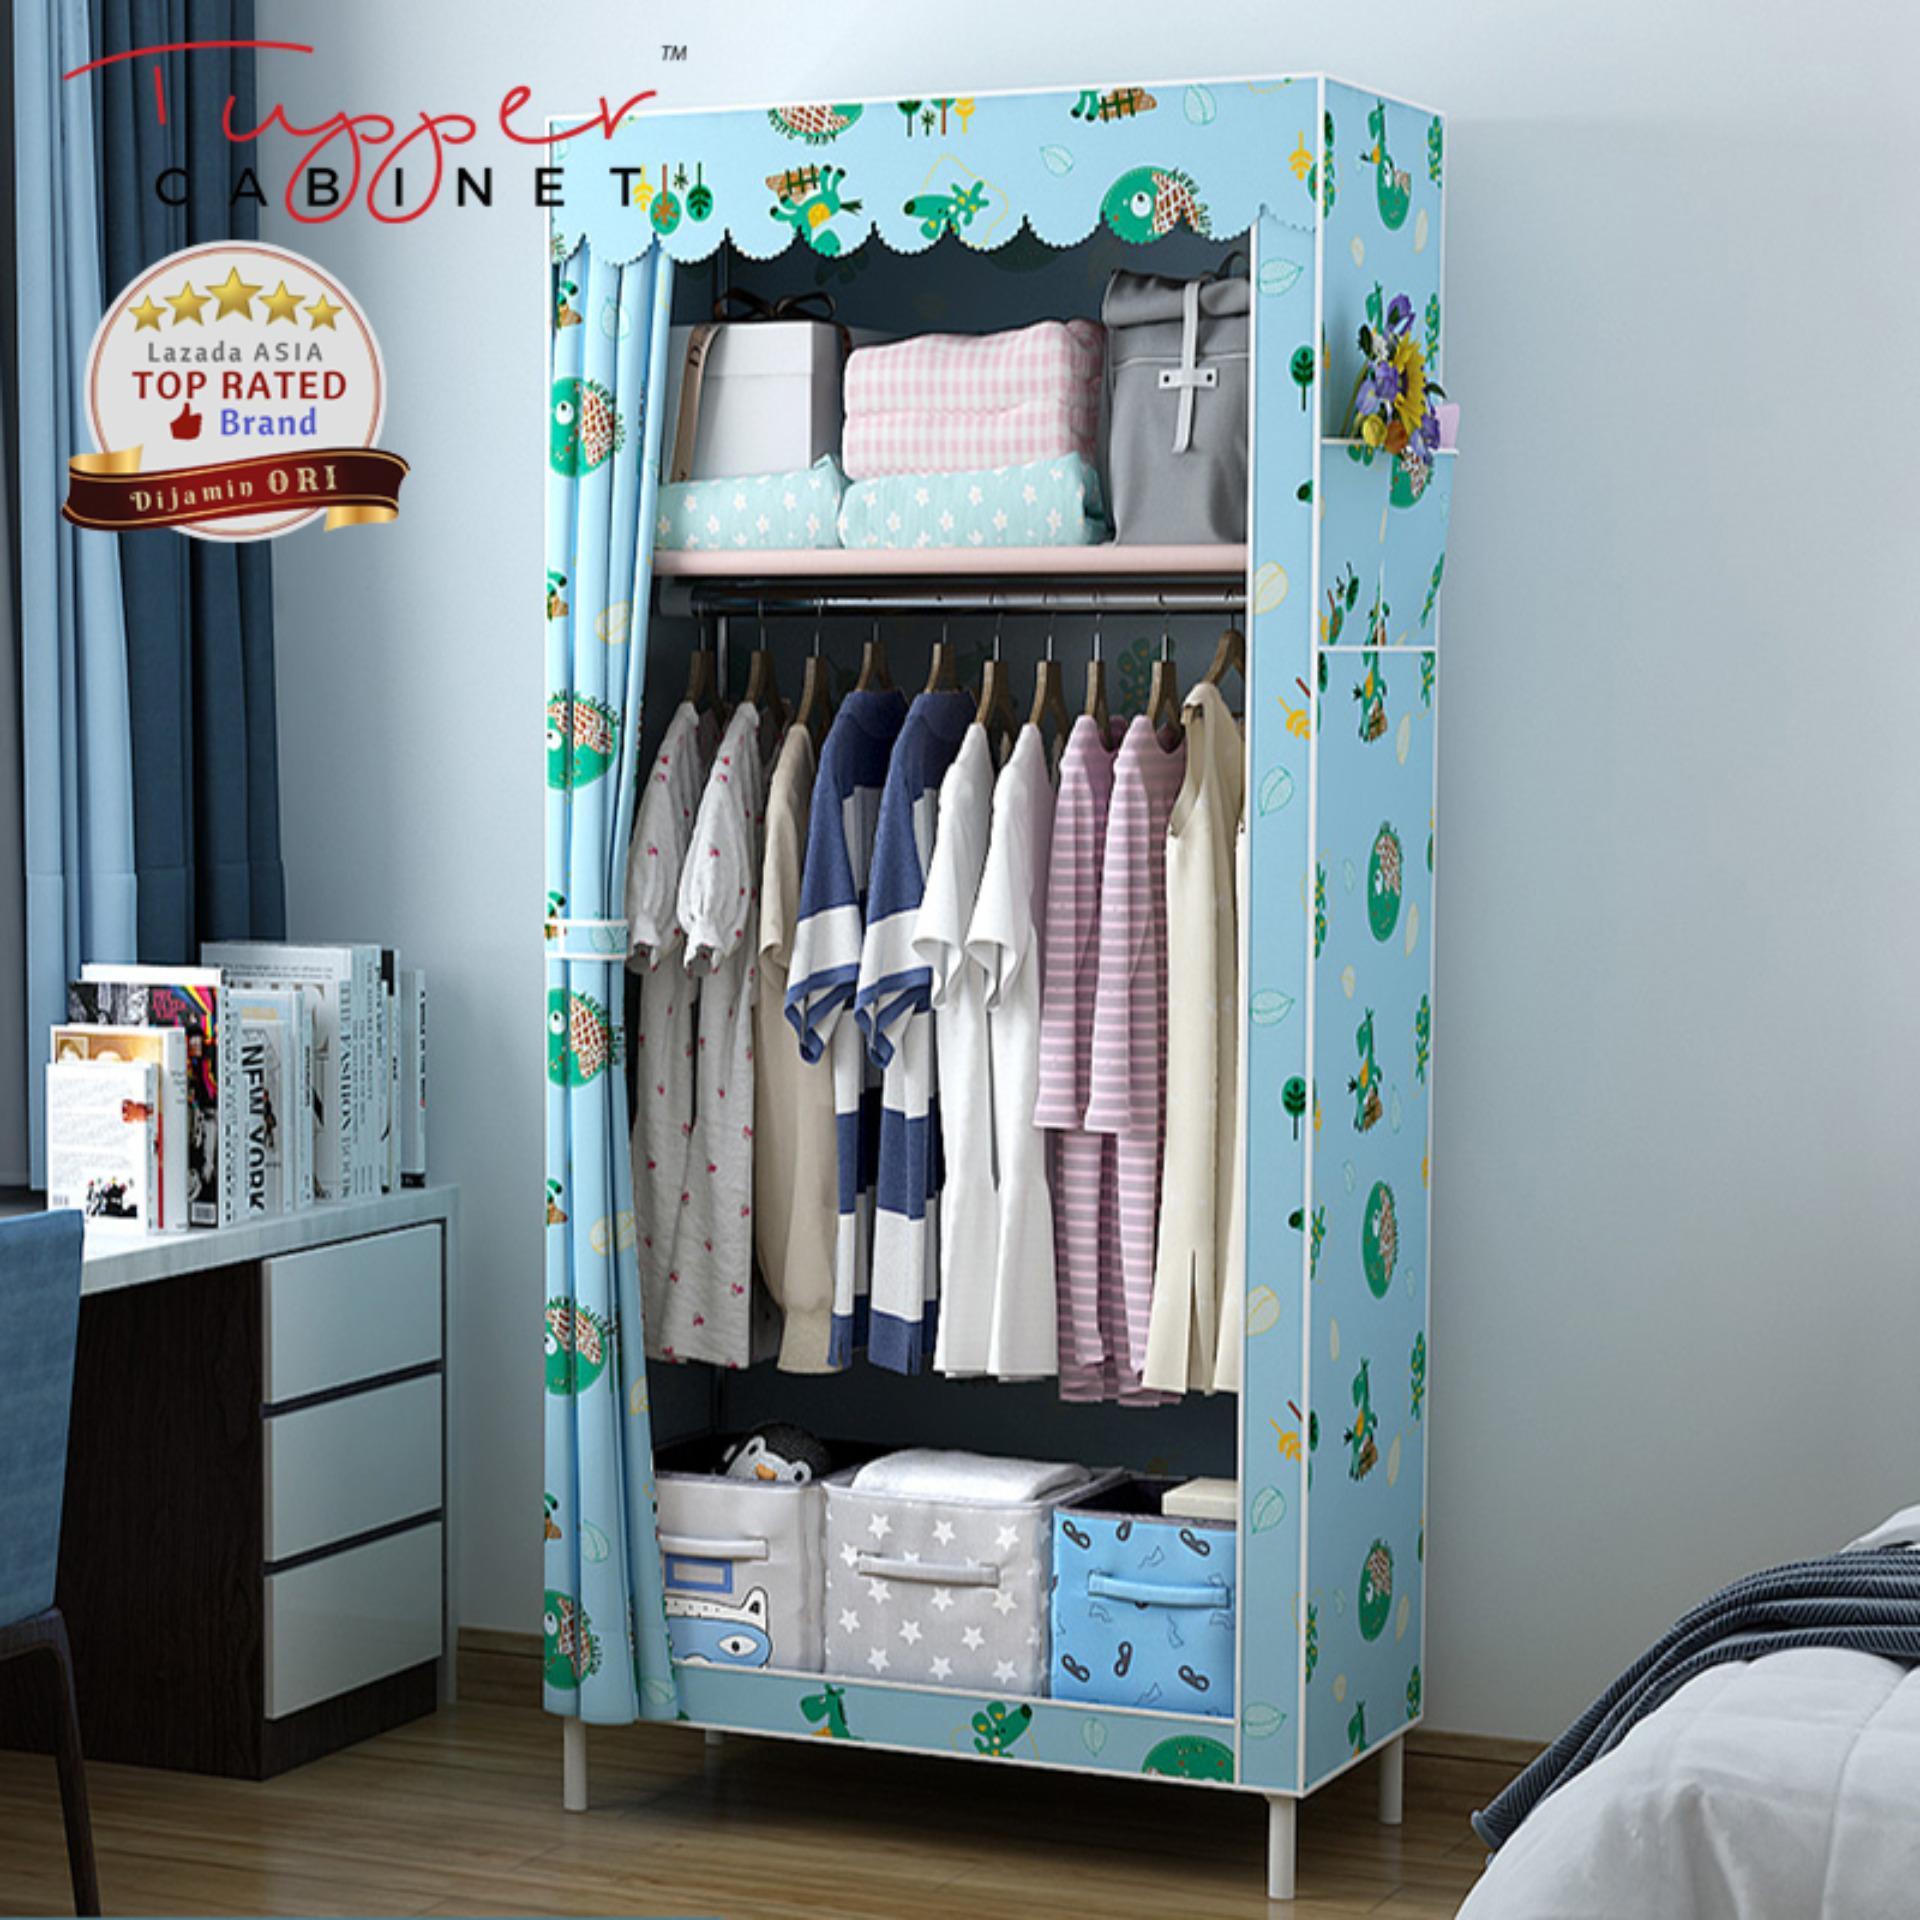 Lemari Pakaian Portabel Cloth Rack Serbaguna Organizer Rak Baju Wardrobe Closet Kain Non-Woven Rangka Besi Y70 By Tupper Cabinet.